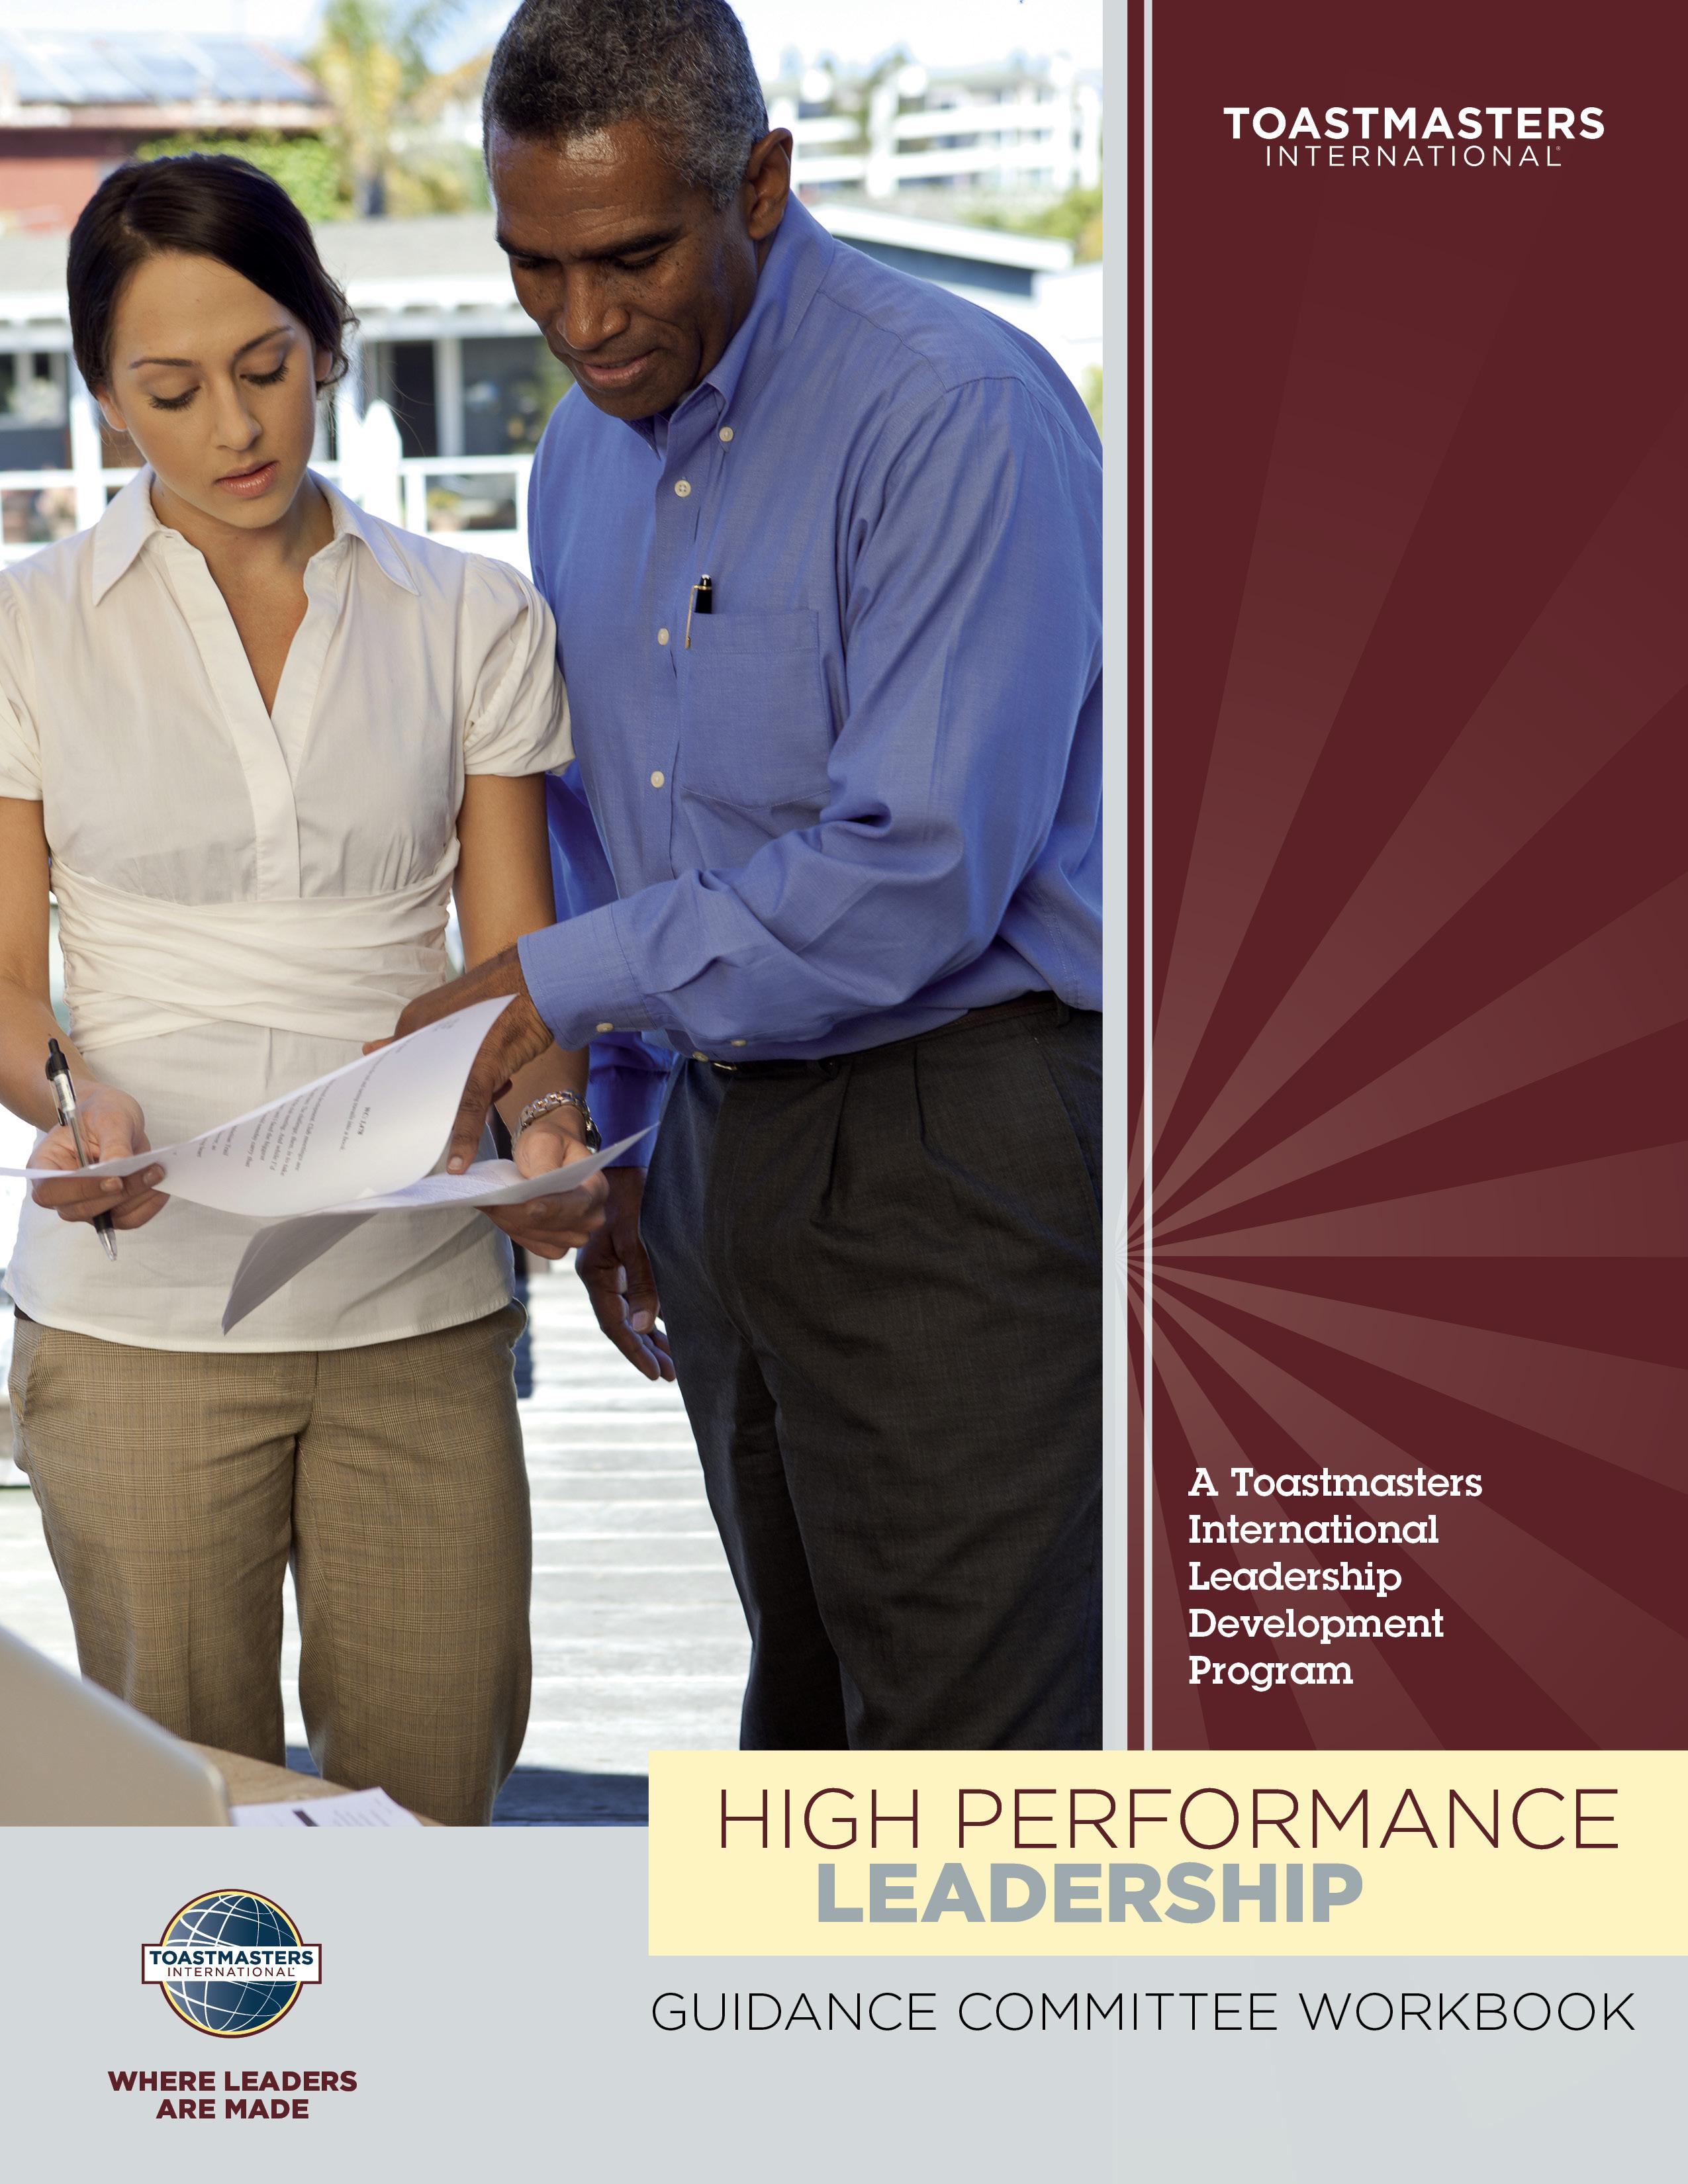 Guidance Committee Workbook